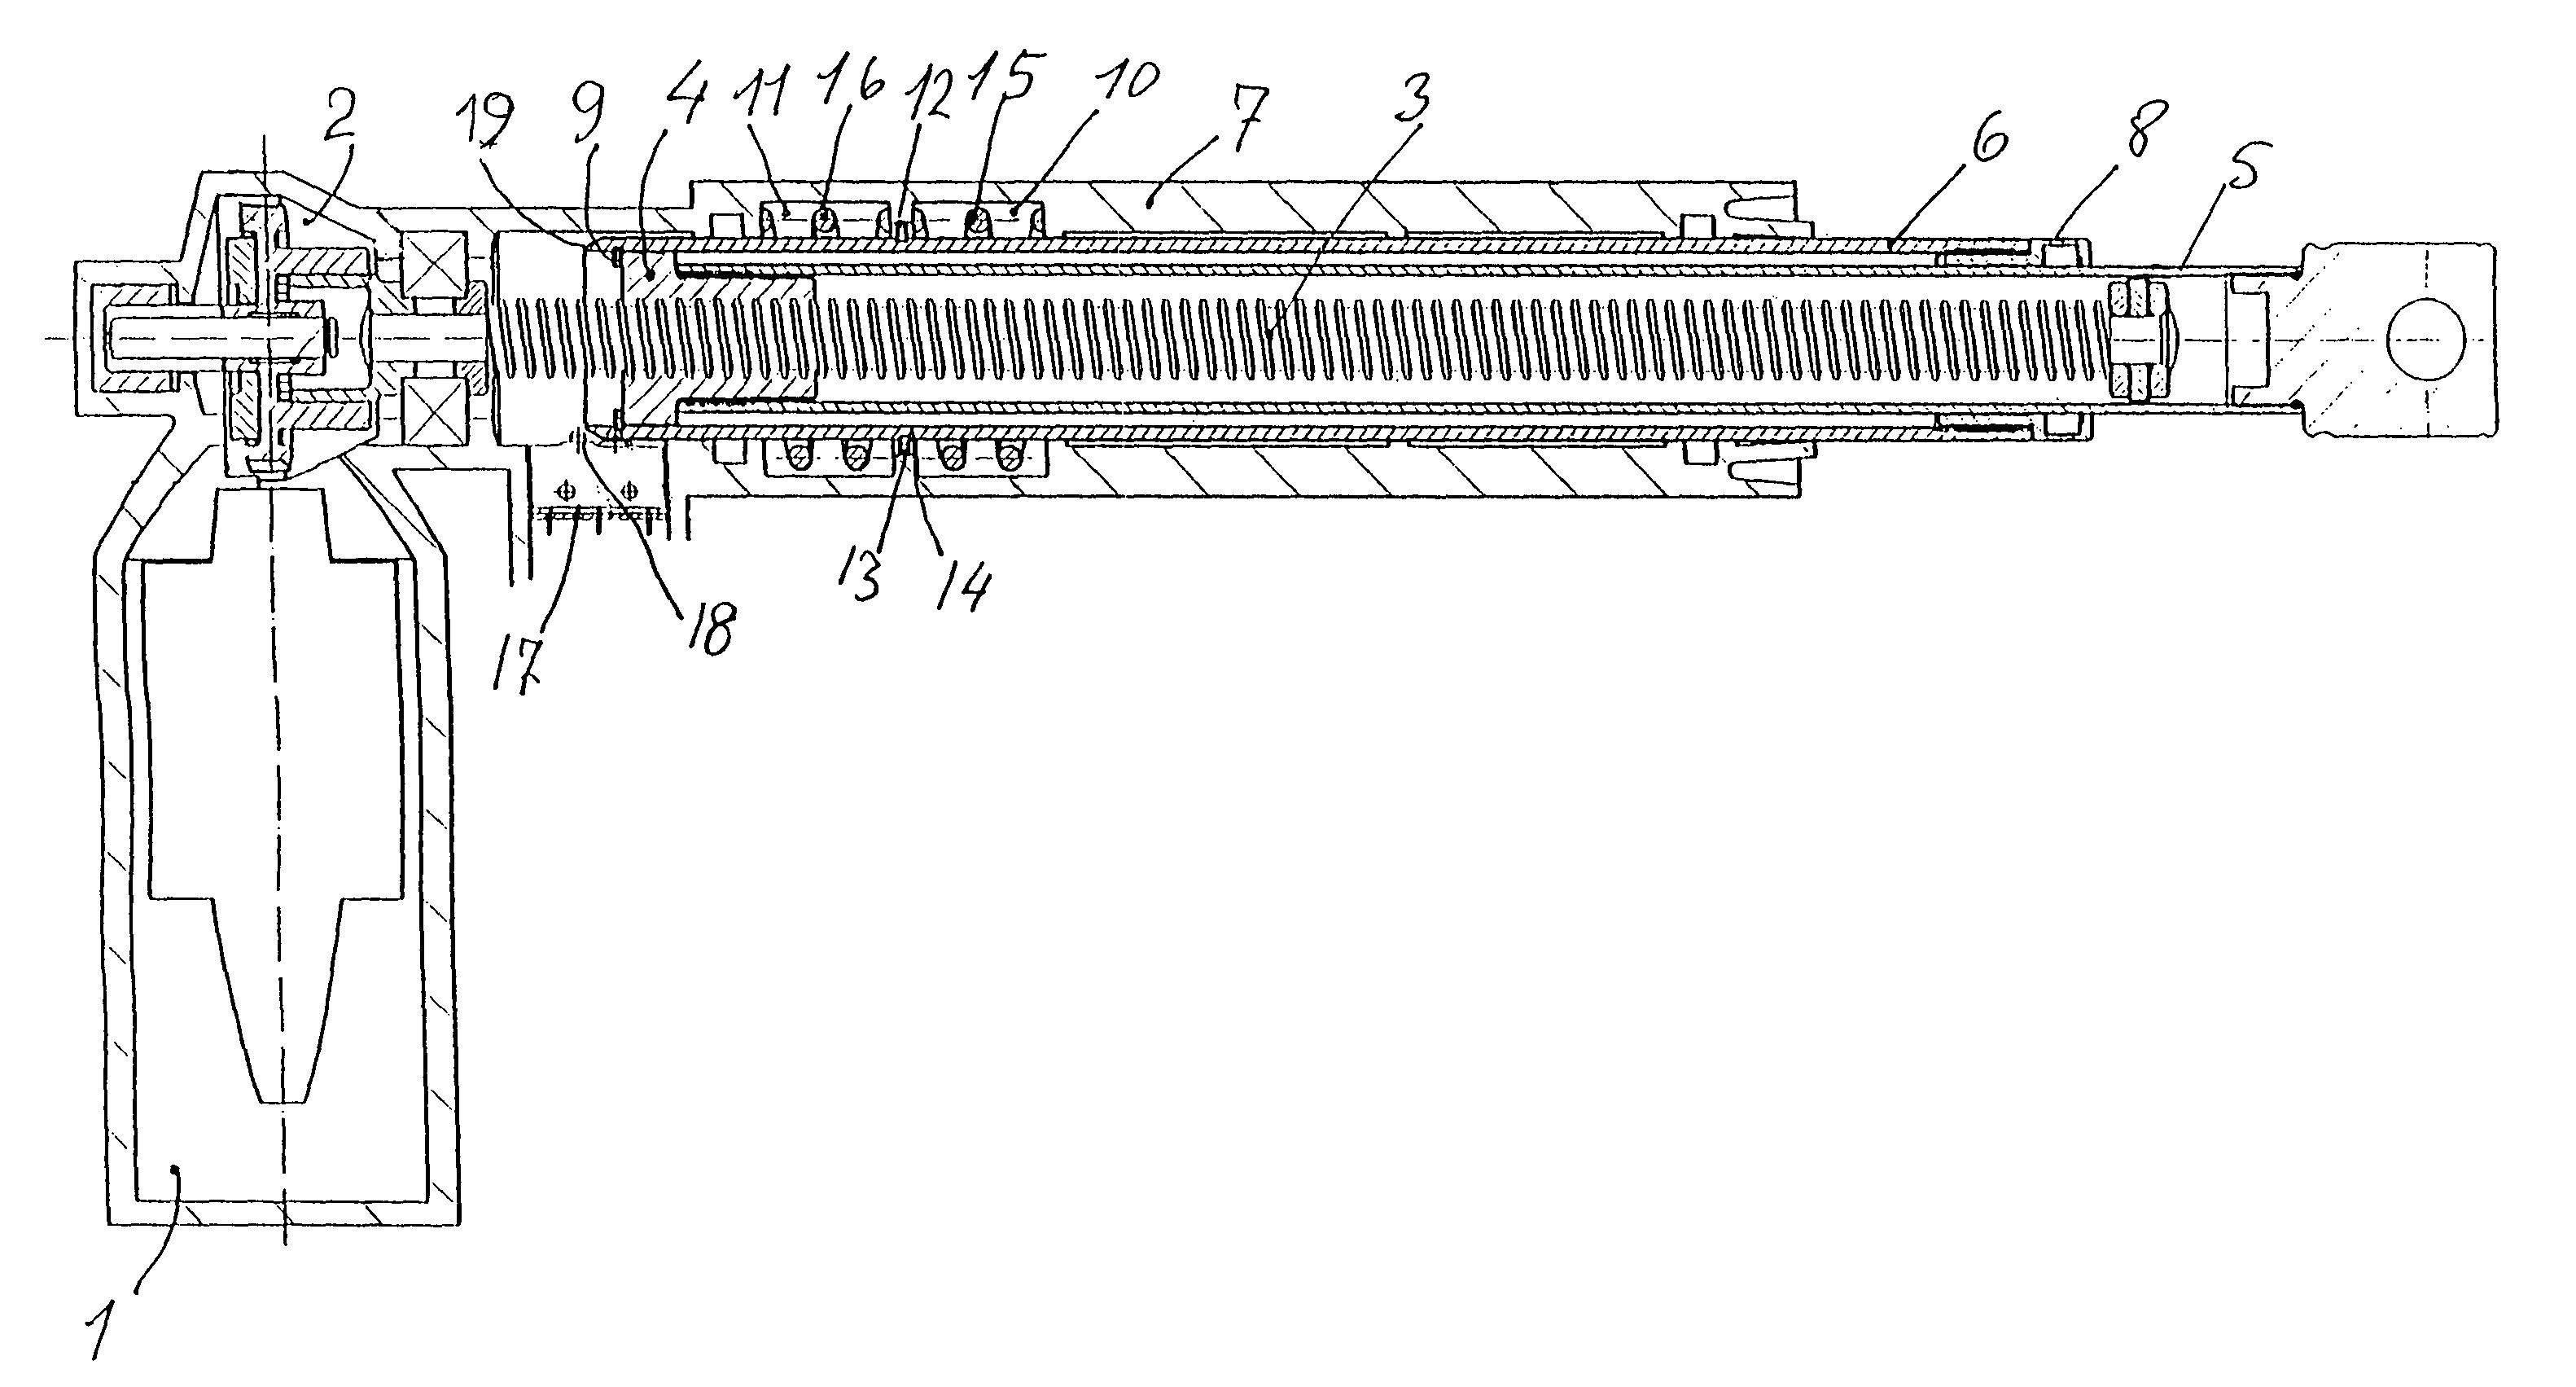 Iei Linear Actuator Wiring Diagram Solutions Schematic Andco Actuators Ignite Radio Control 2 Ohm Dvc